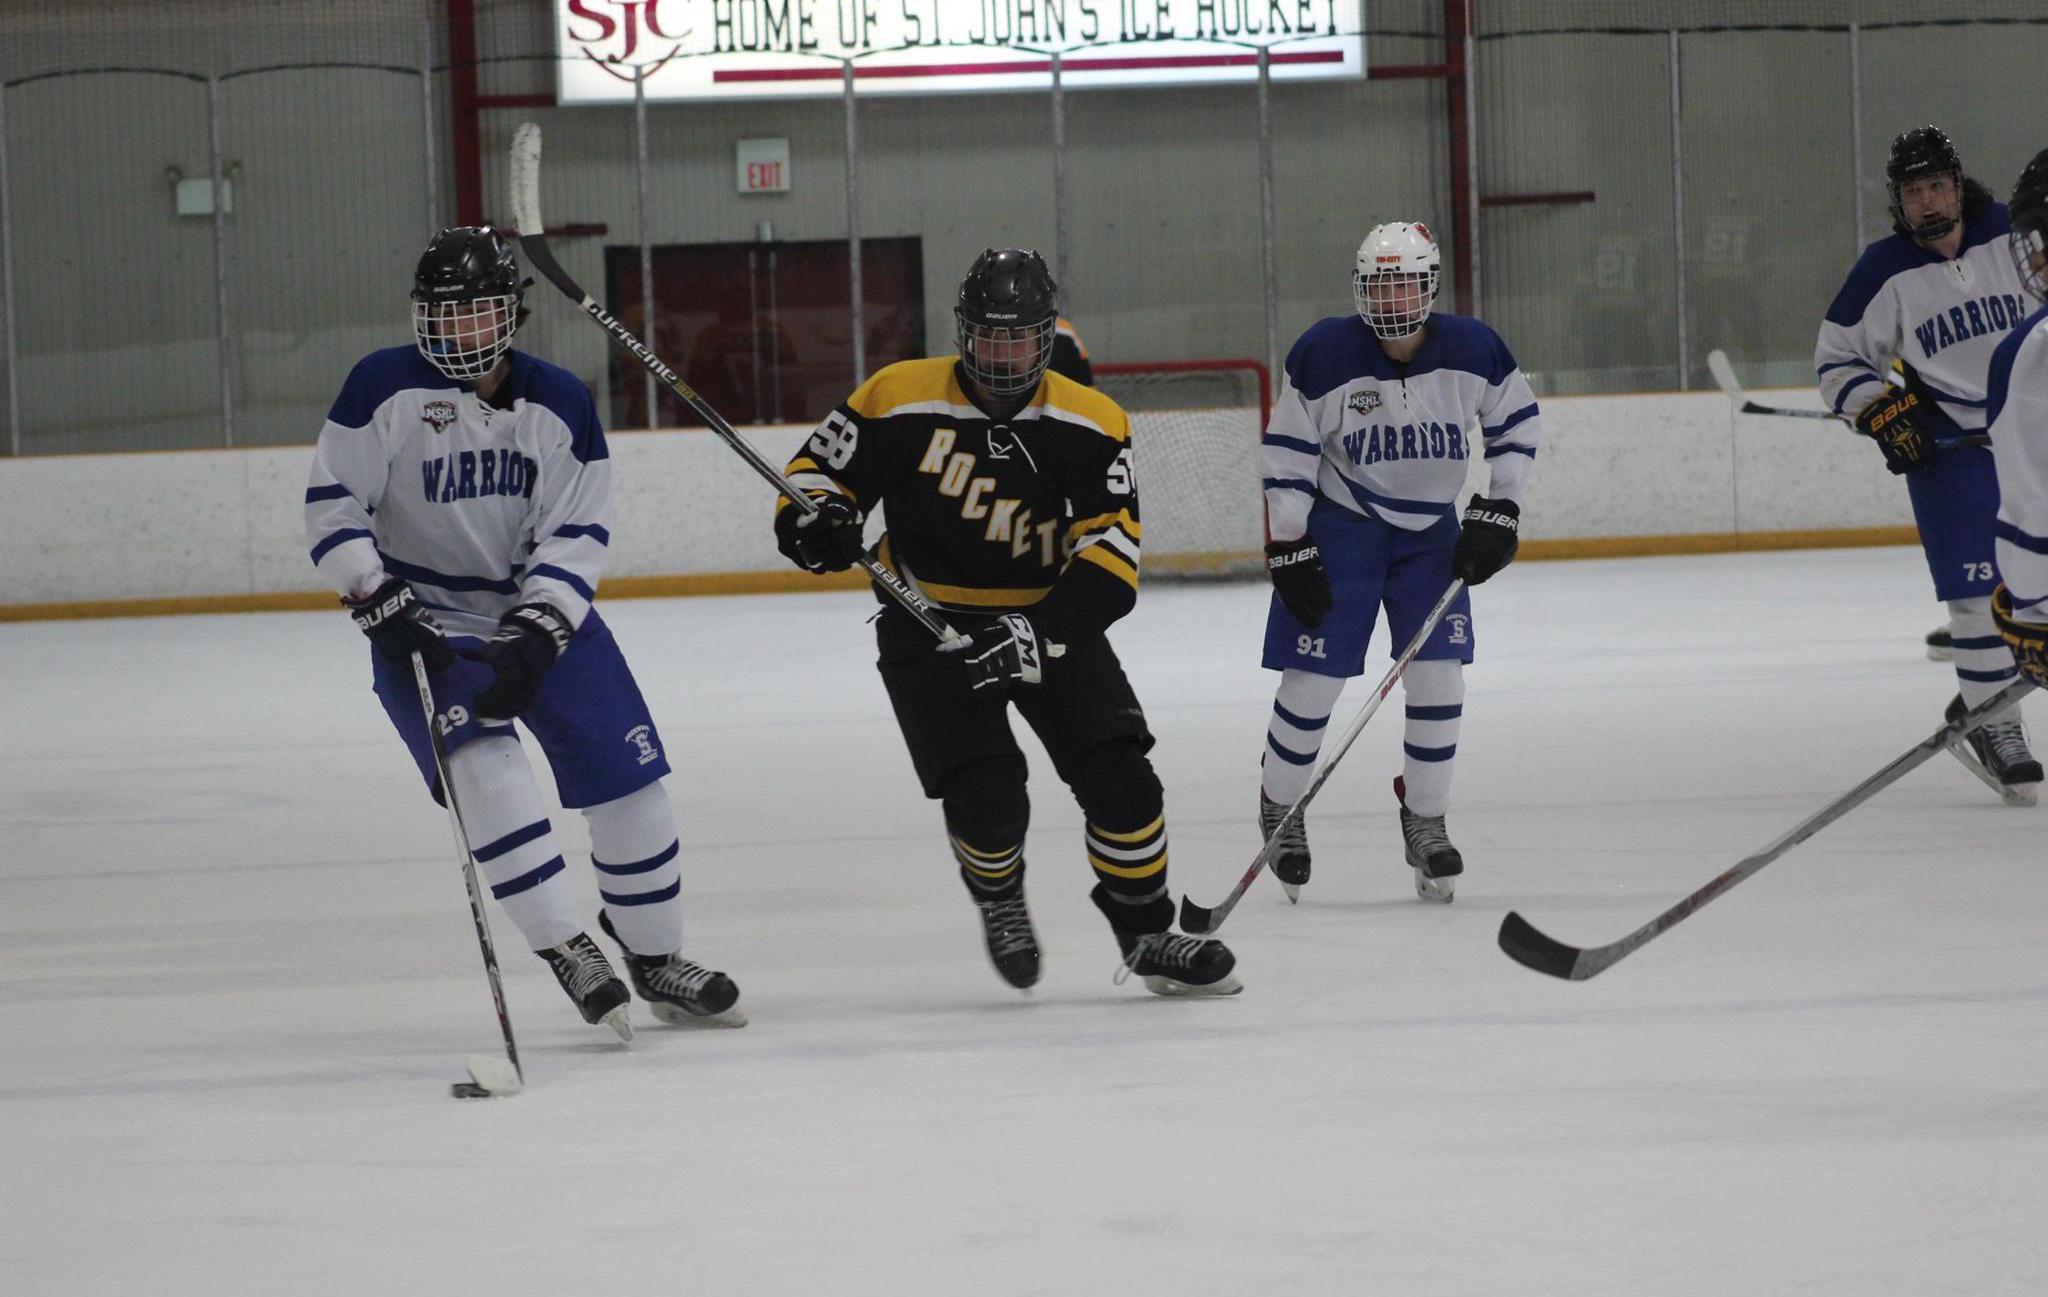 Photo Gallery: RM Ice Hockey v. Sherwood